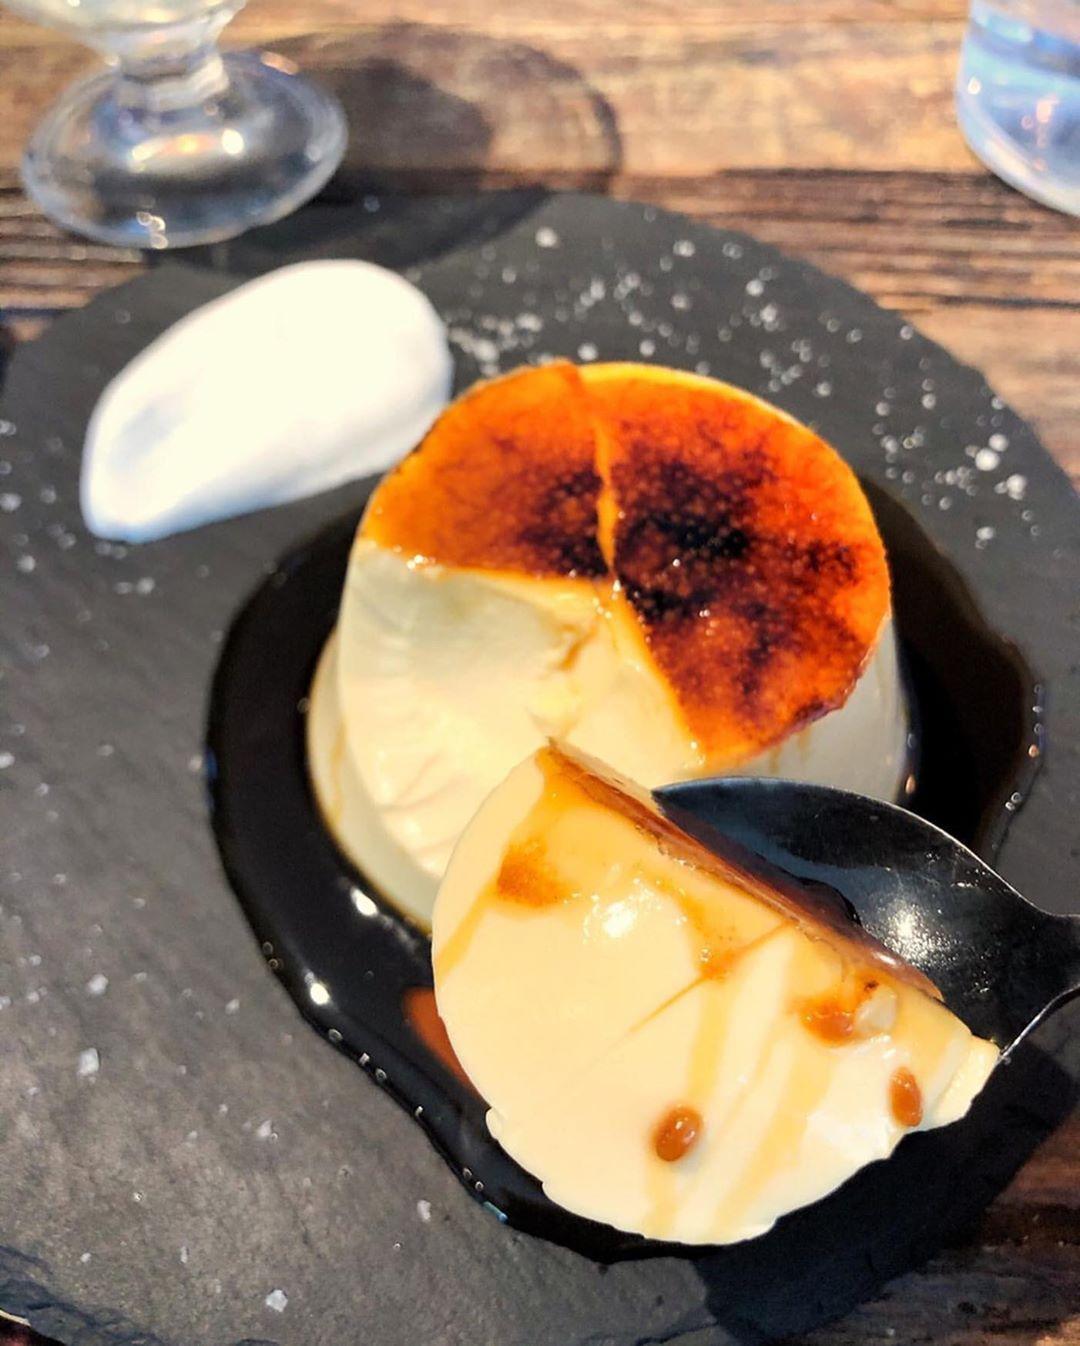 @RETRIP Gourmet: 【RETRIP×神奈川】 こちらは神奈川・溝の口にある「Teto-Teo(テトテヲ)」です。こちらでいただける